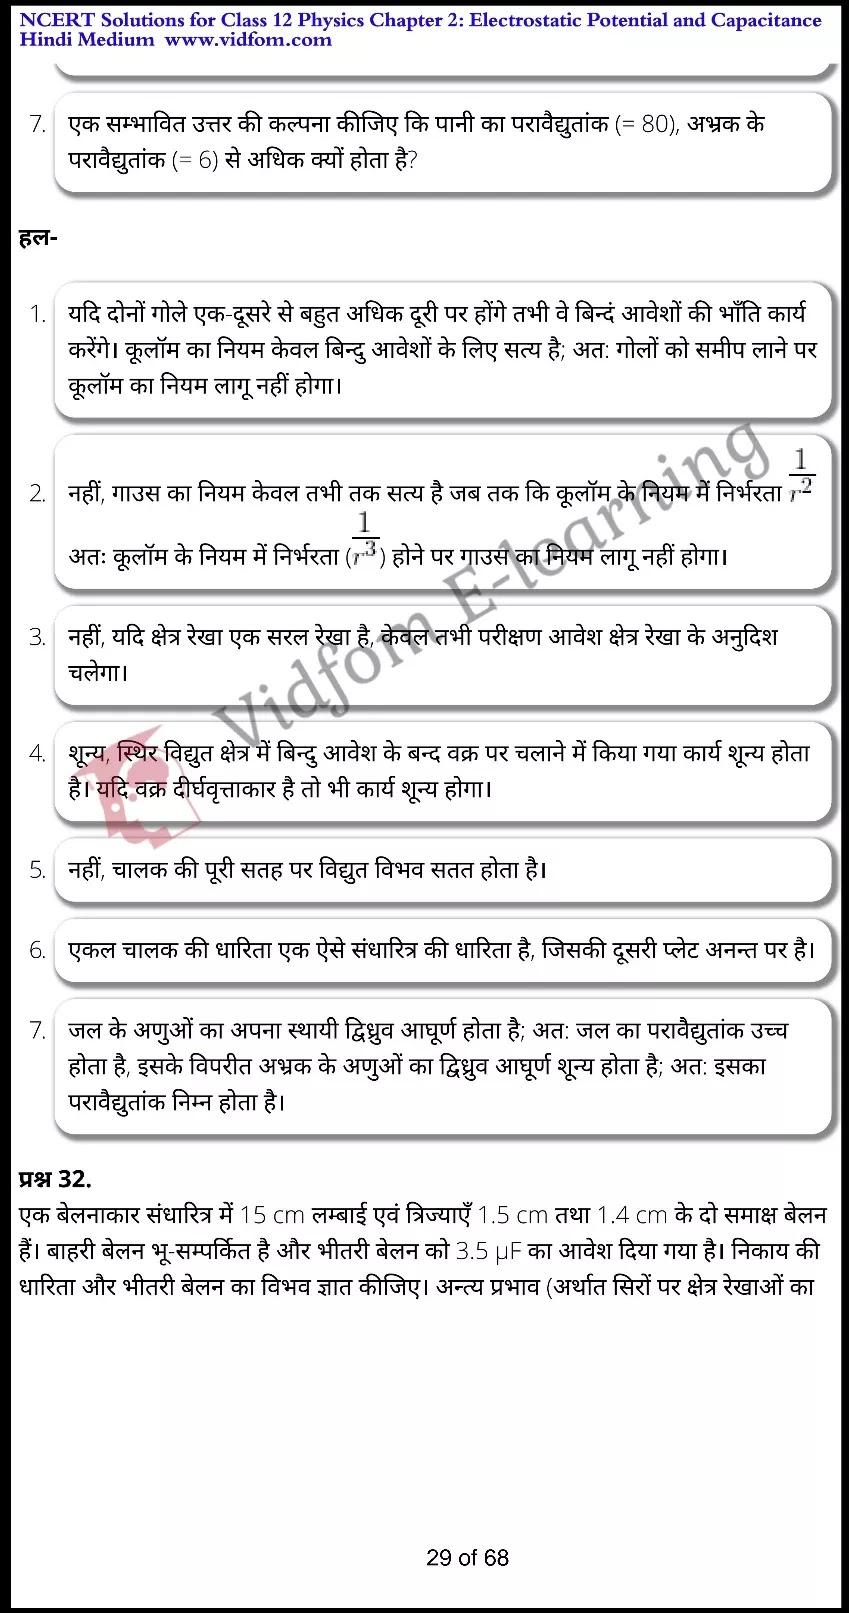 class 12 physics chapter 2 light hindi medium 29